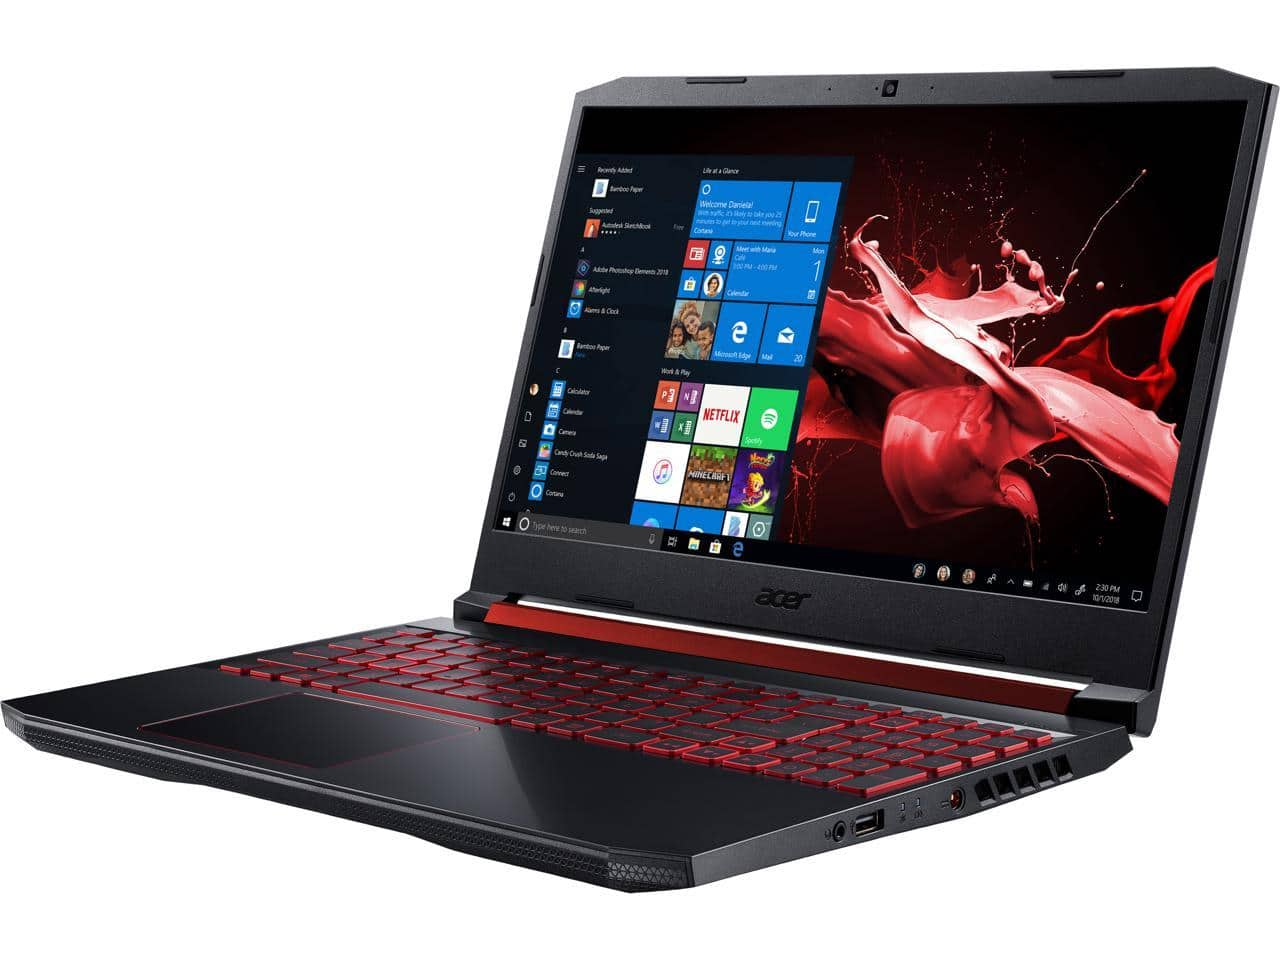 Acer Nitro 5: 15.6'' FHD IPS 144 Hz, i5-9300H, 16GB DDR4, 256GB PCIe SSD, 1TB HDD, RTX 2060, WIn10H @ $899 + F/S